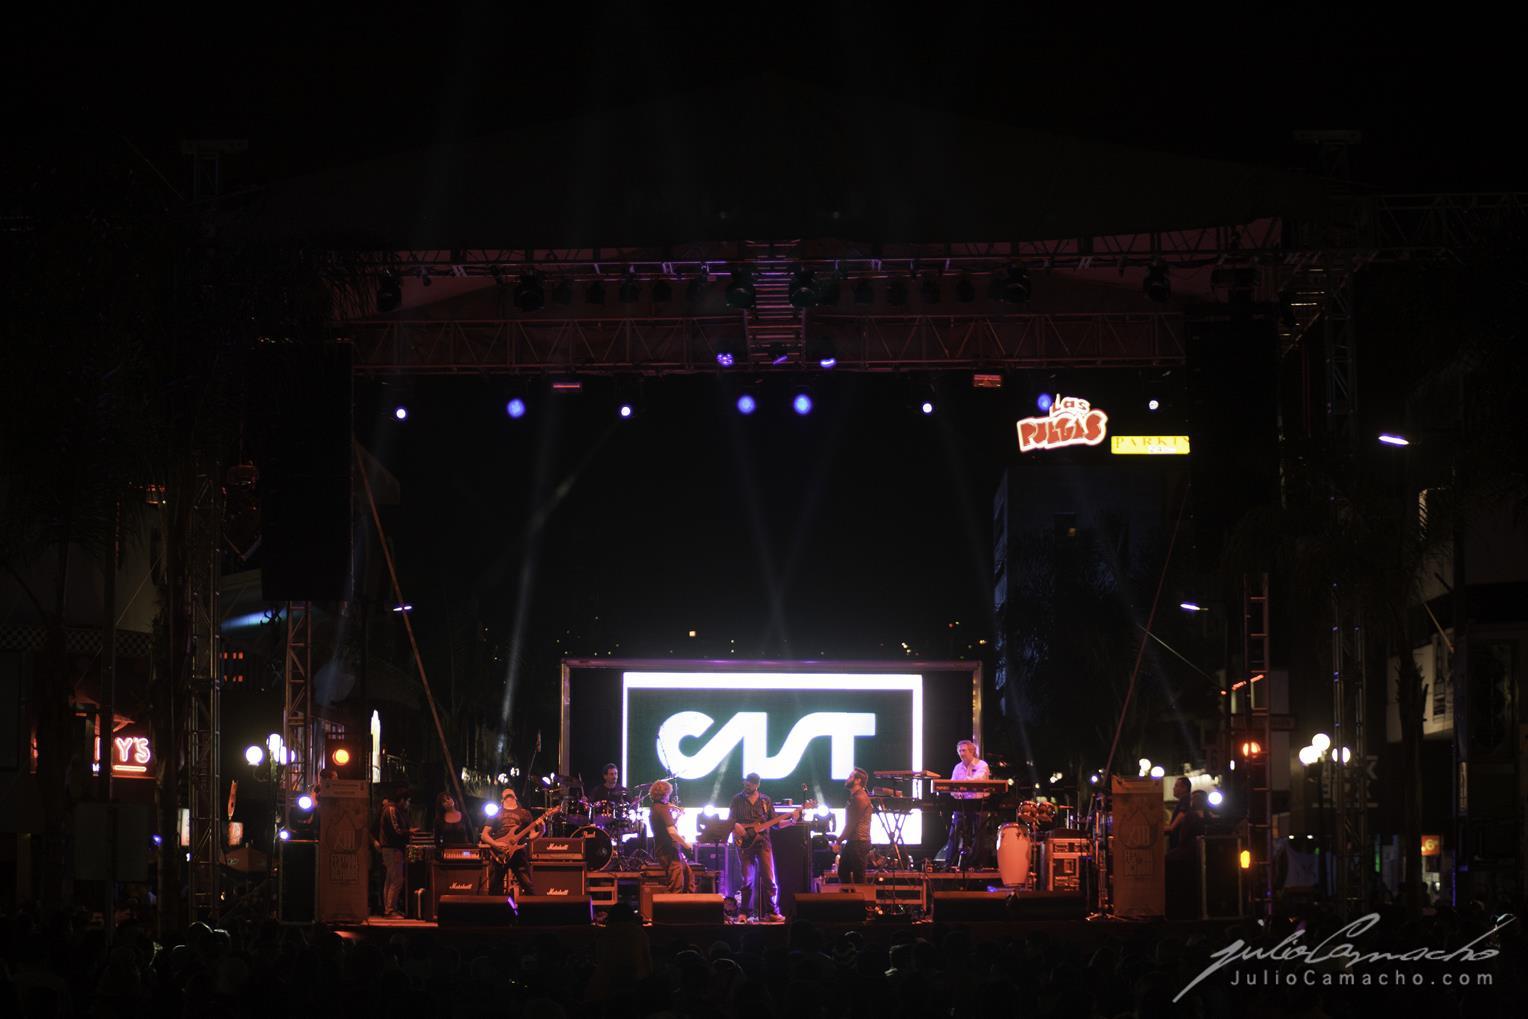 2014-10-30 31 CAST TOUR Ensenada y Tijuana - 1445 - www.Juli (Copy).jpg